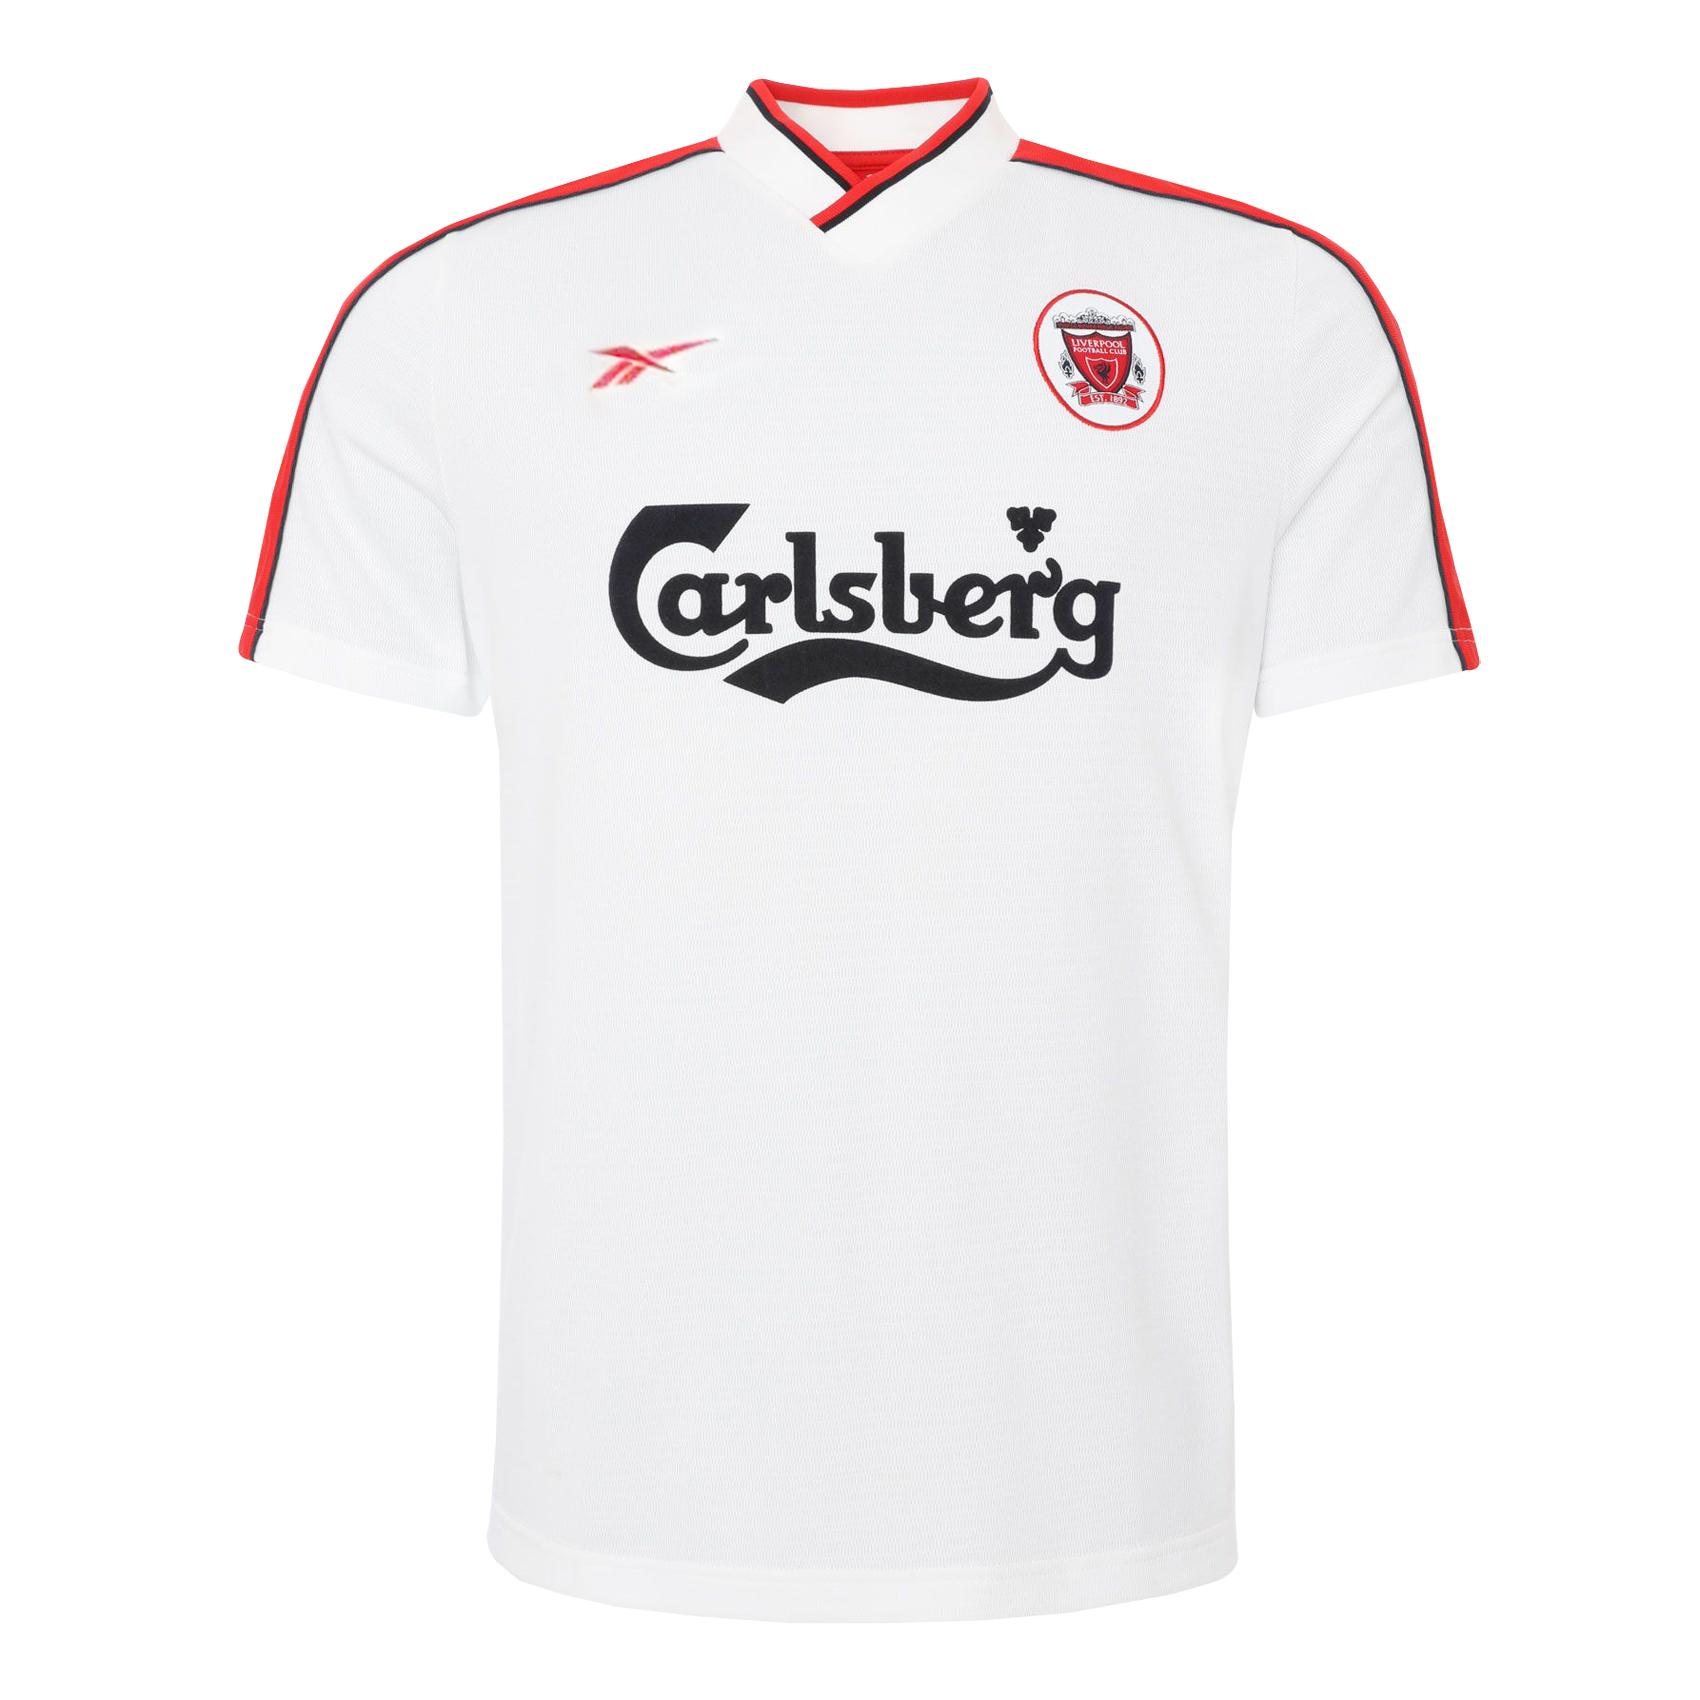 US$ 18.80 - Liverpool Away Retro Jersey Mens 1998 - m ...